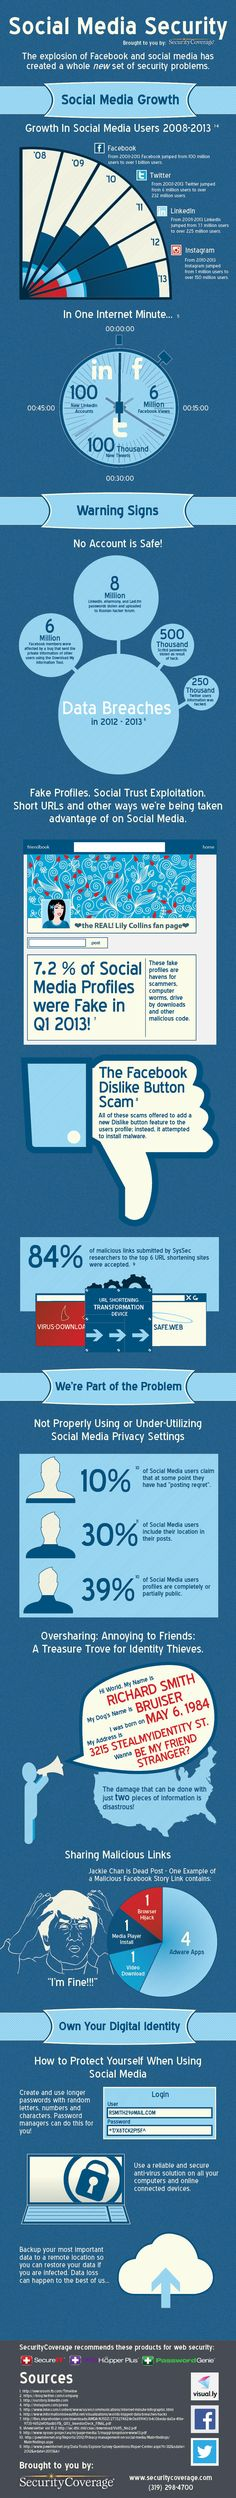 Facebook, Twitter, LinkedIn, Instagram – Social Media Security Tips [INFOGRAPHIC]